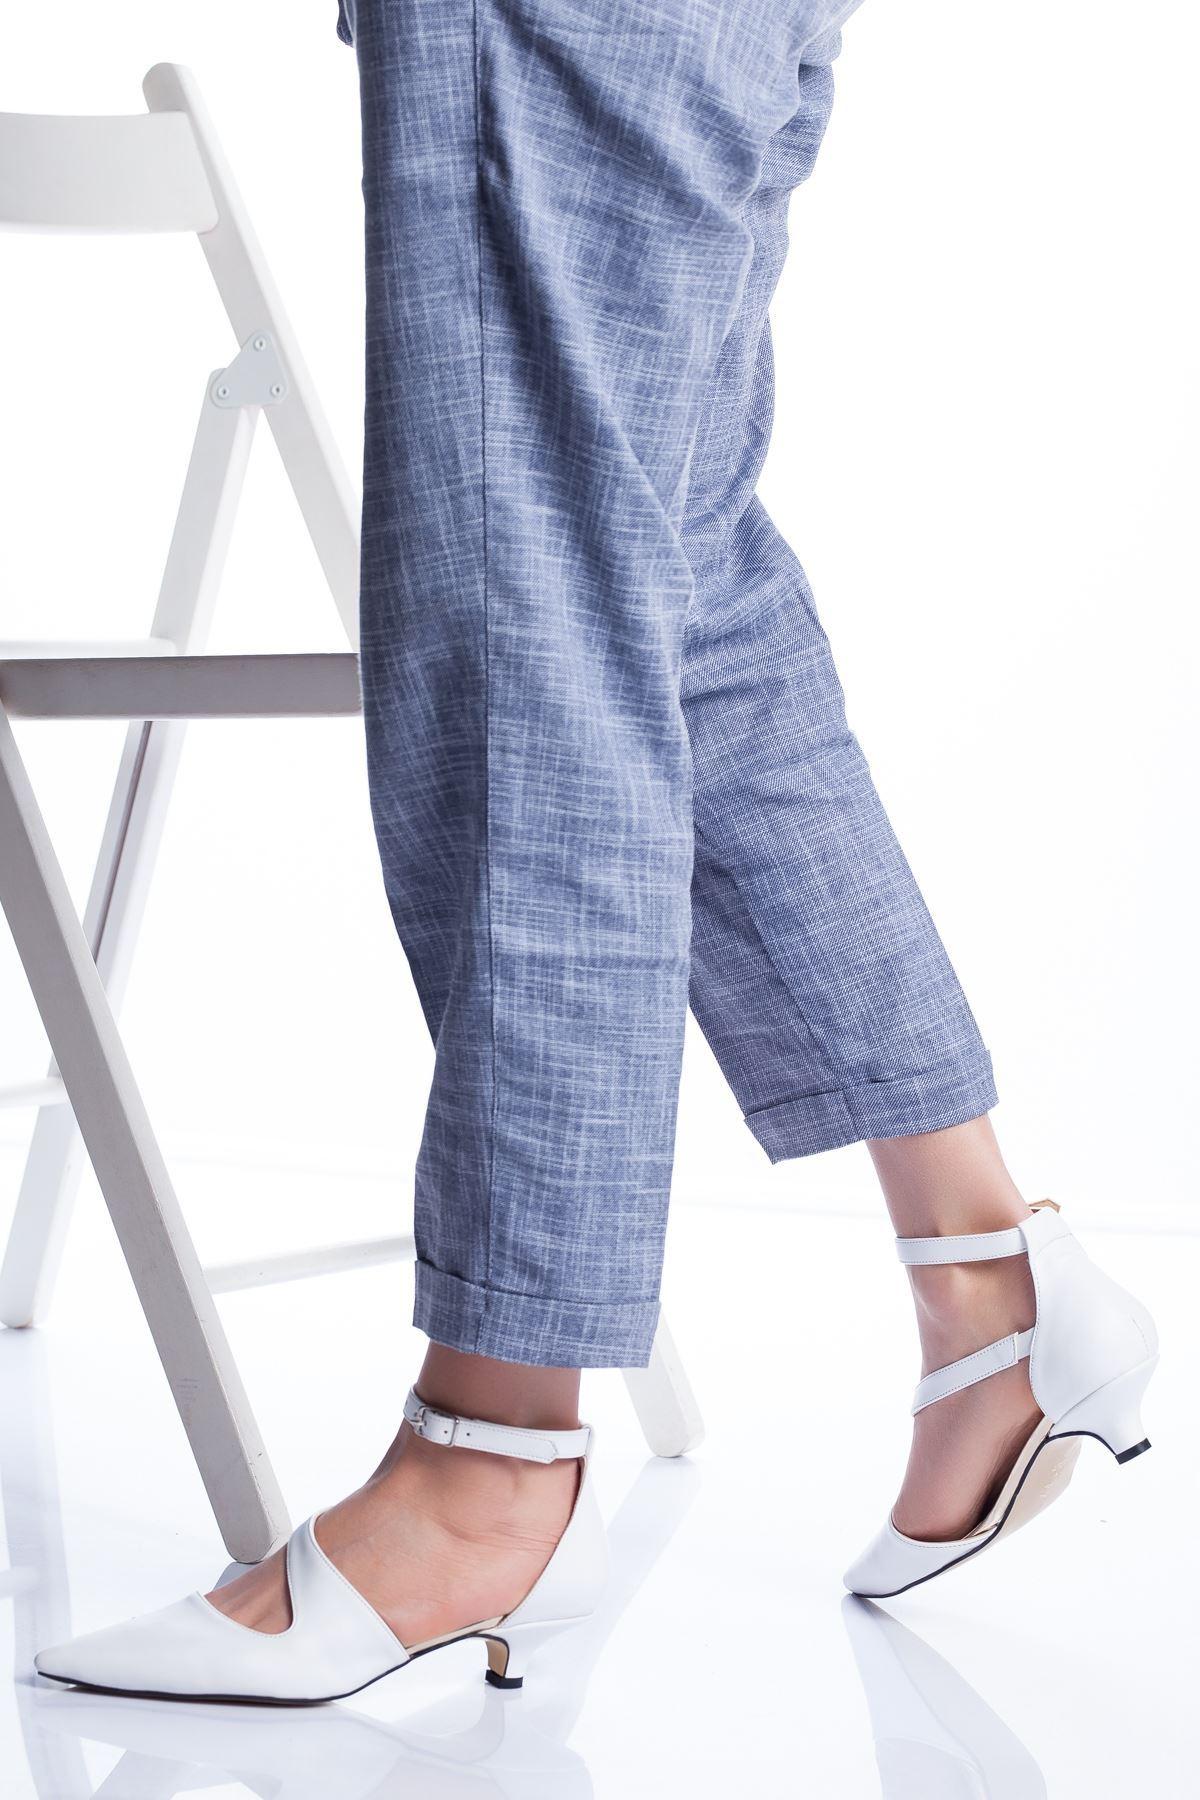 Costa Topuklu Ayakkabı BEYAZ CİLT